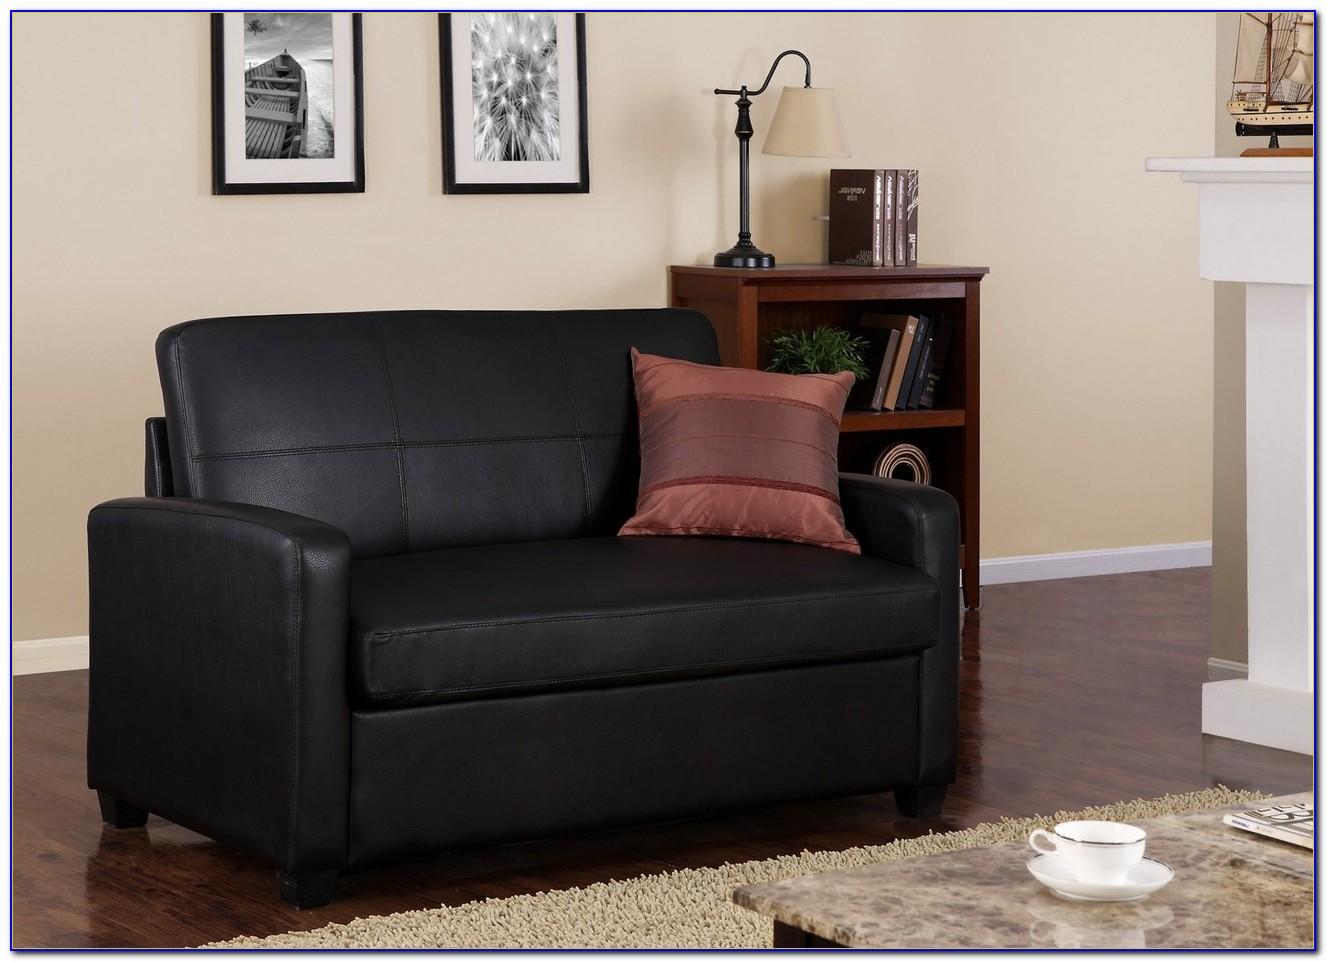 Black Leather Modern Sectional Sofa Sleeper With Ottoman